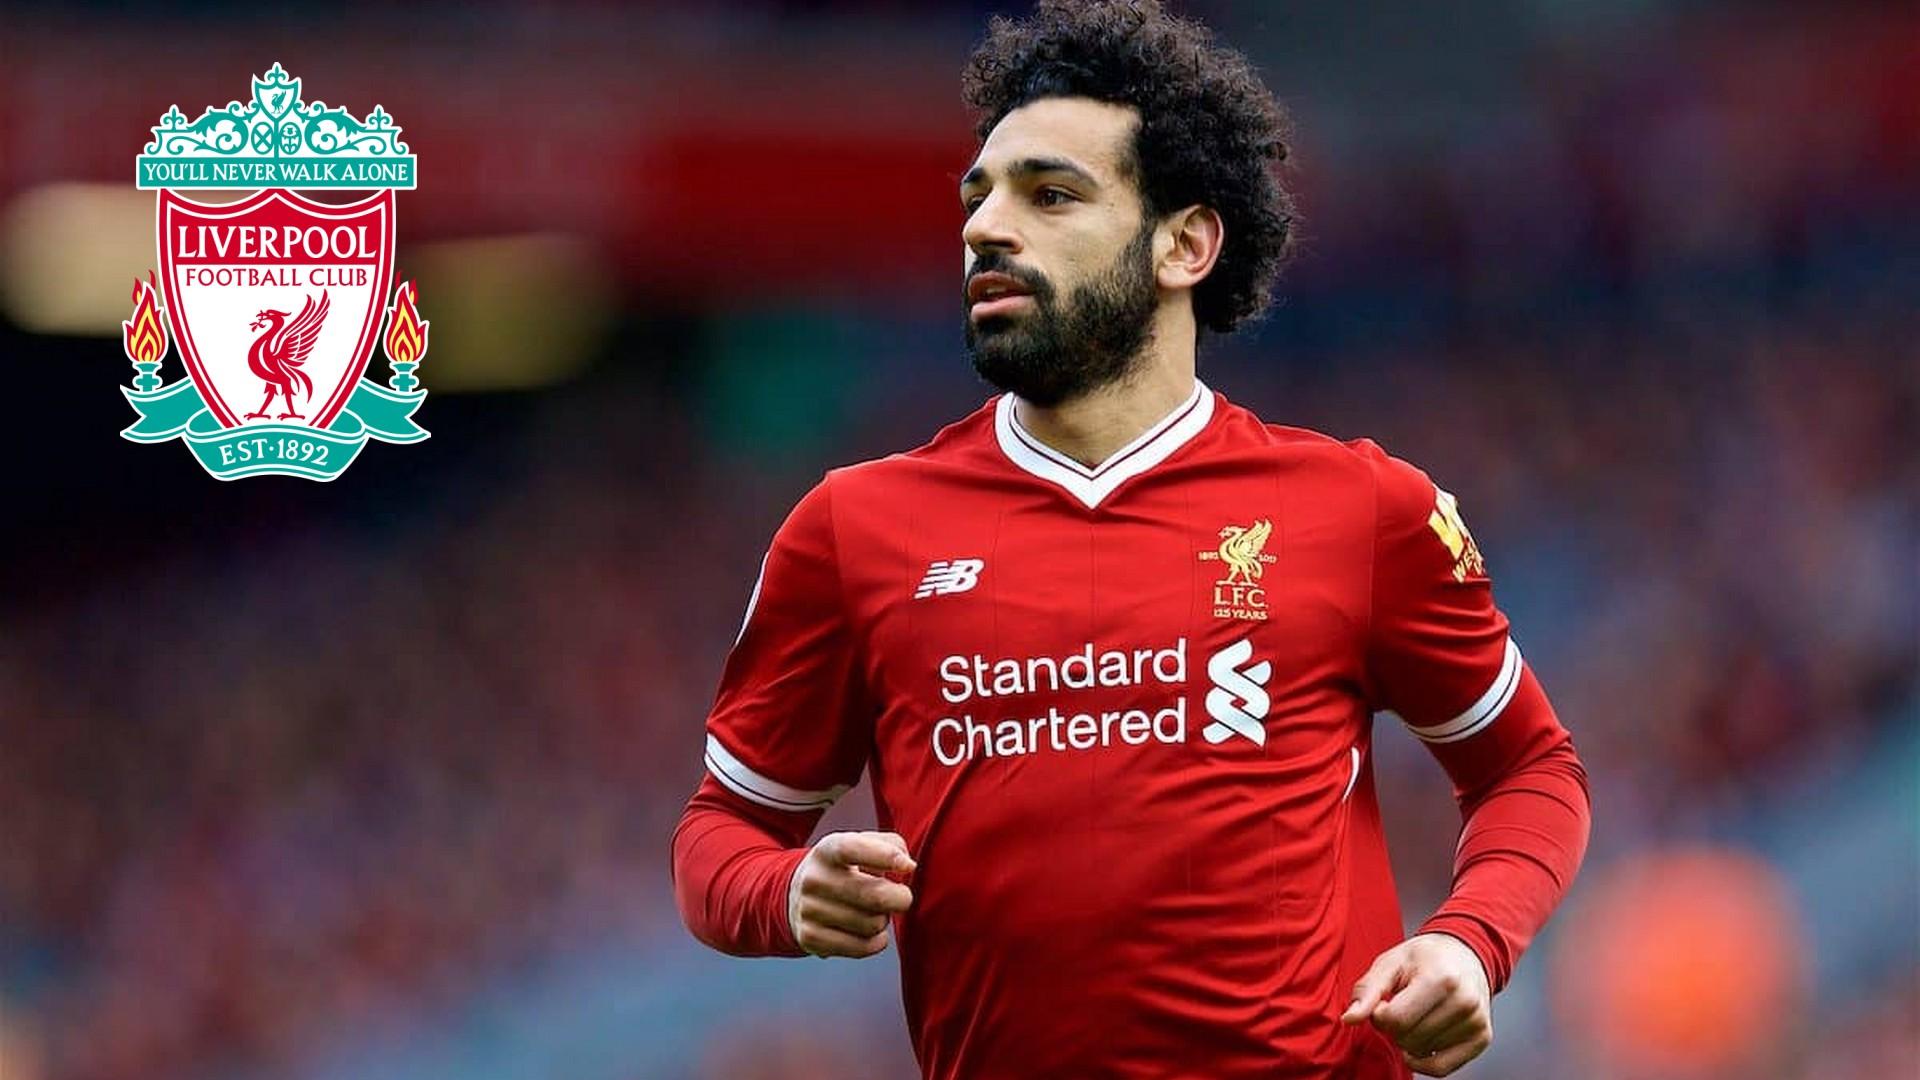 mohamed salah bilder5 - 11 Mohamed Salah Bilder